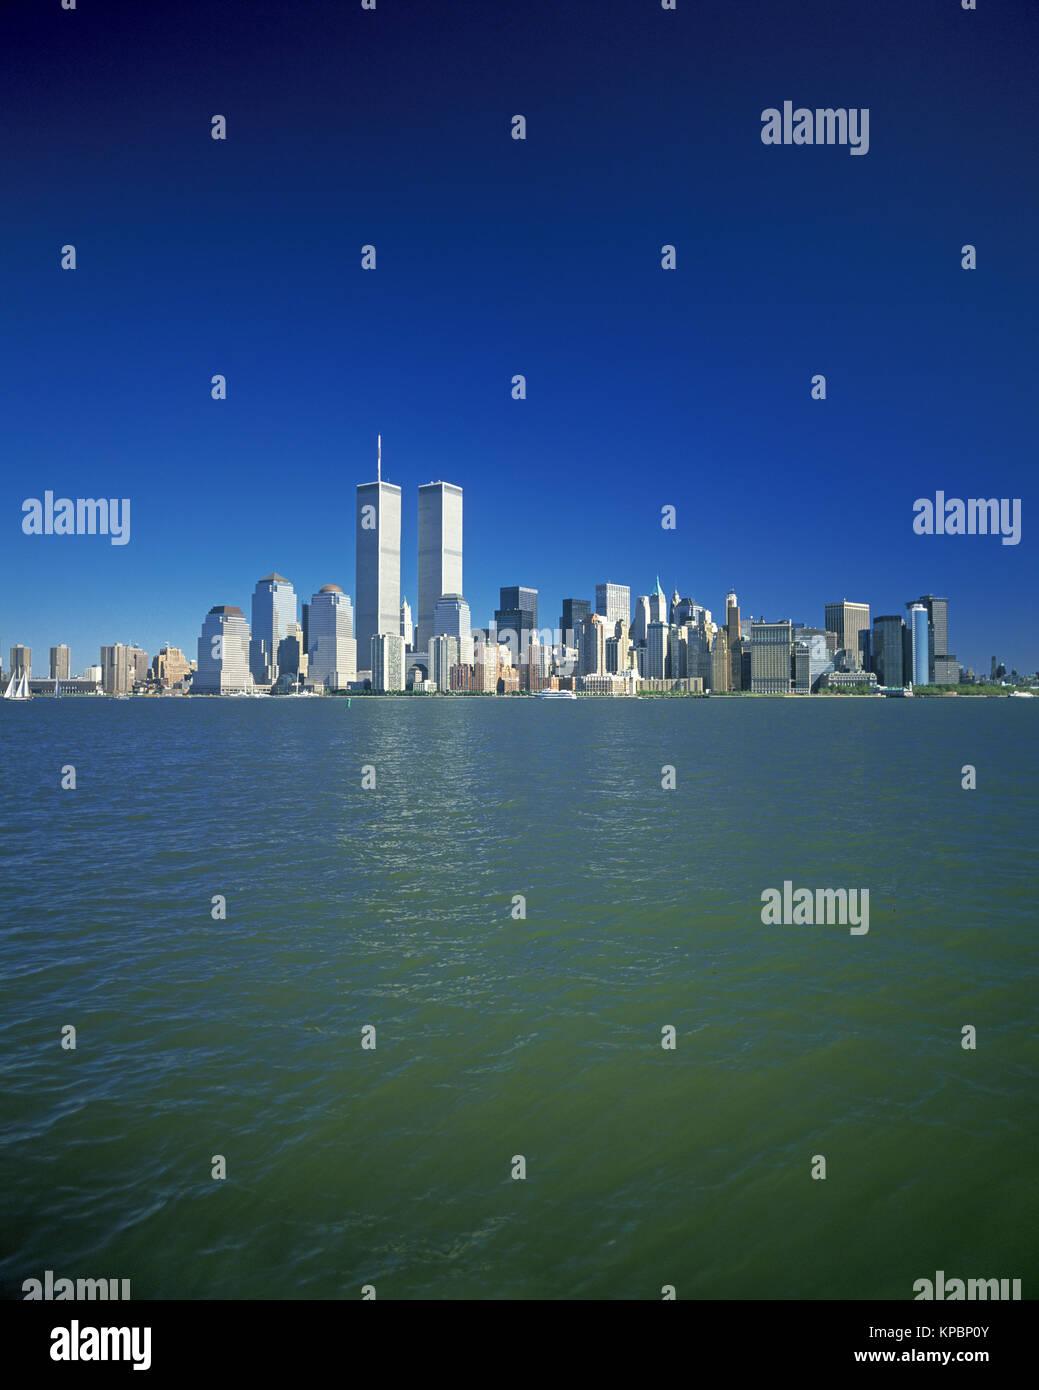 1989 HISTORICAL TWIN TOWERS (©MINORU YAMASAKI 1973) DOWNTOWN SKYLINE HUDSON RIVER MANHATTAN NEW YORK CITY USA - Stock Image